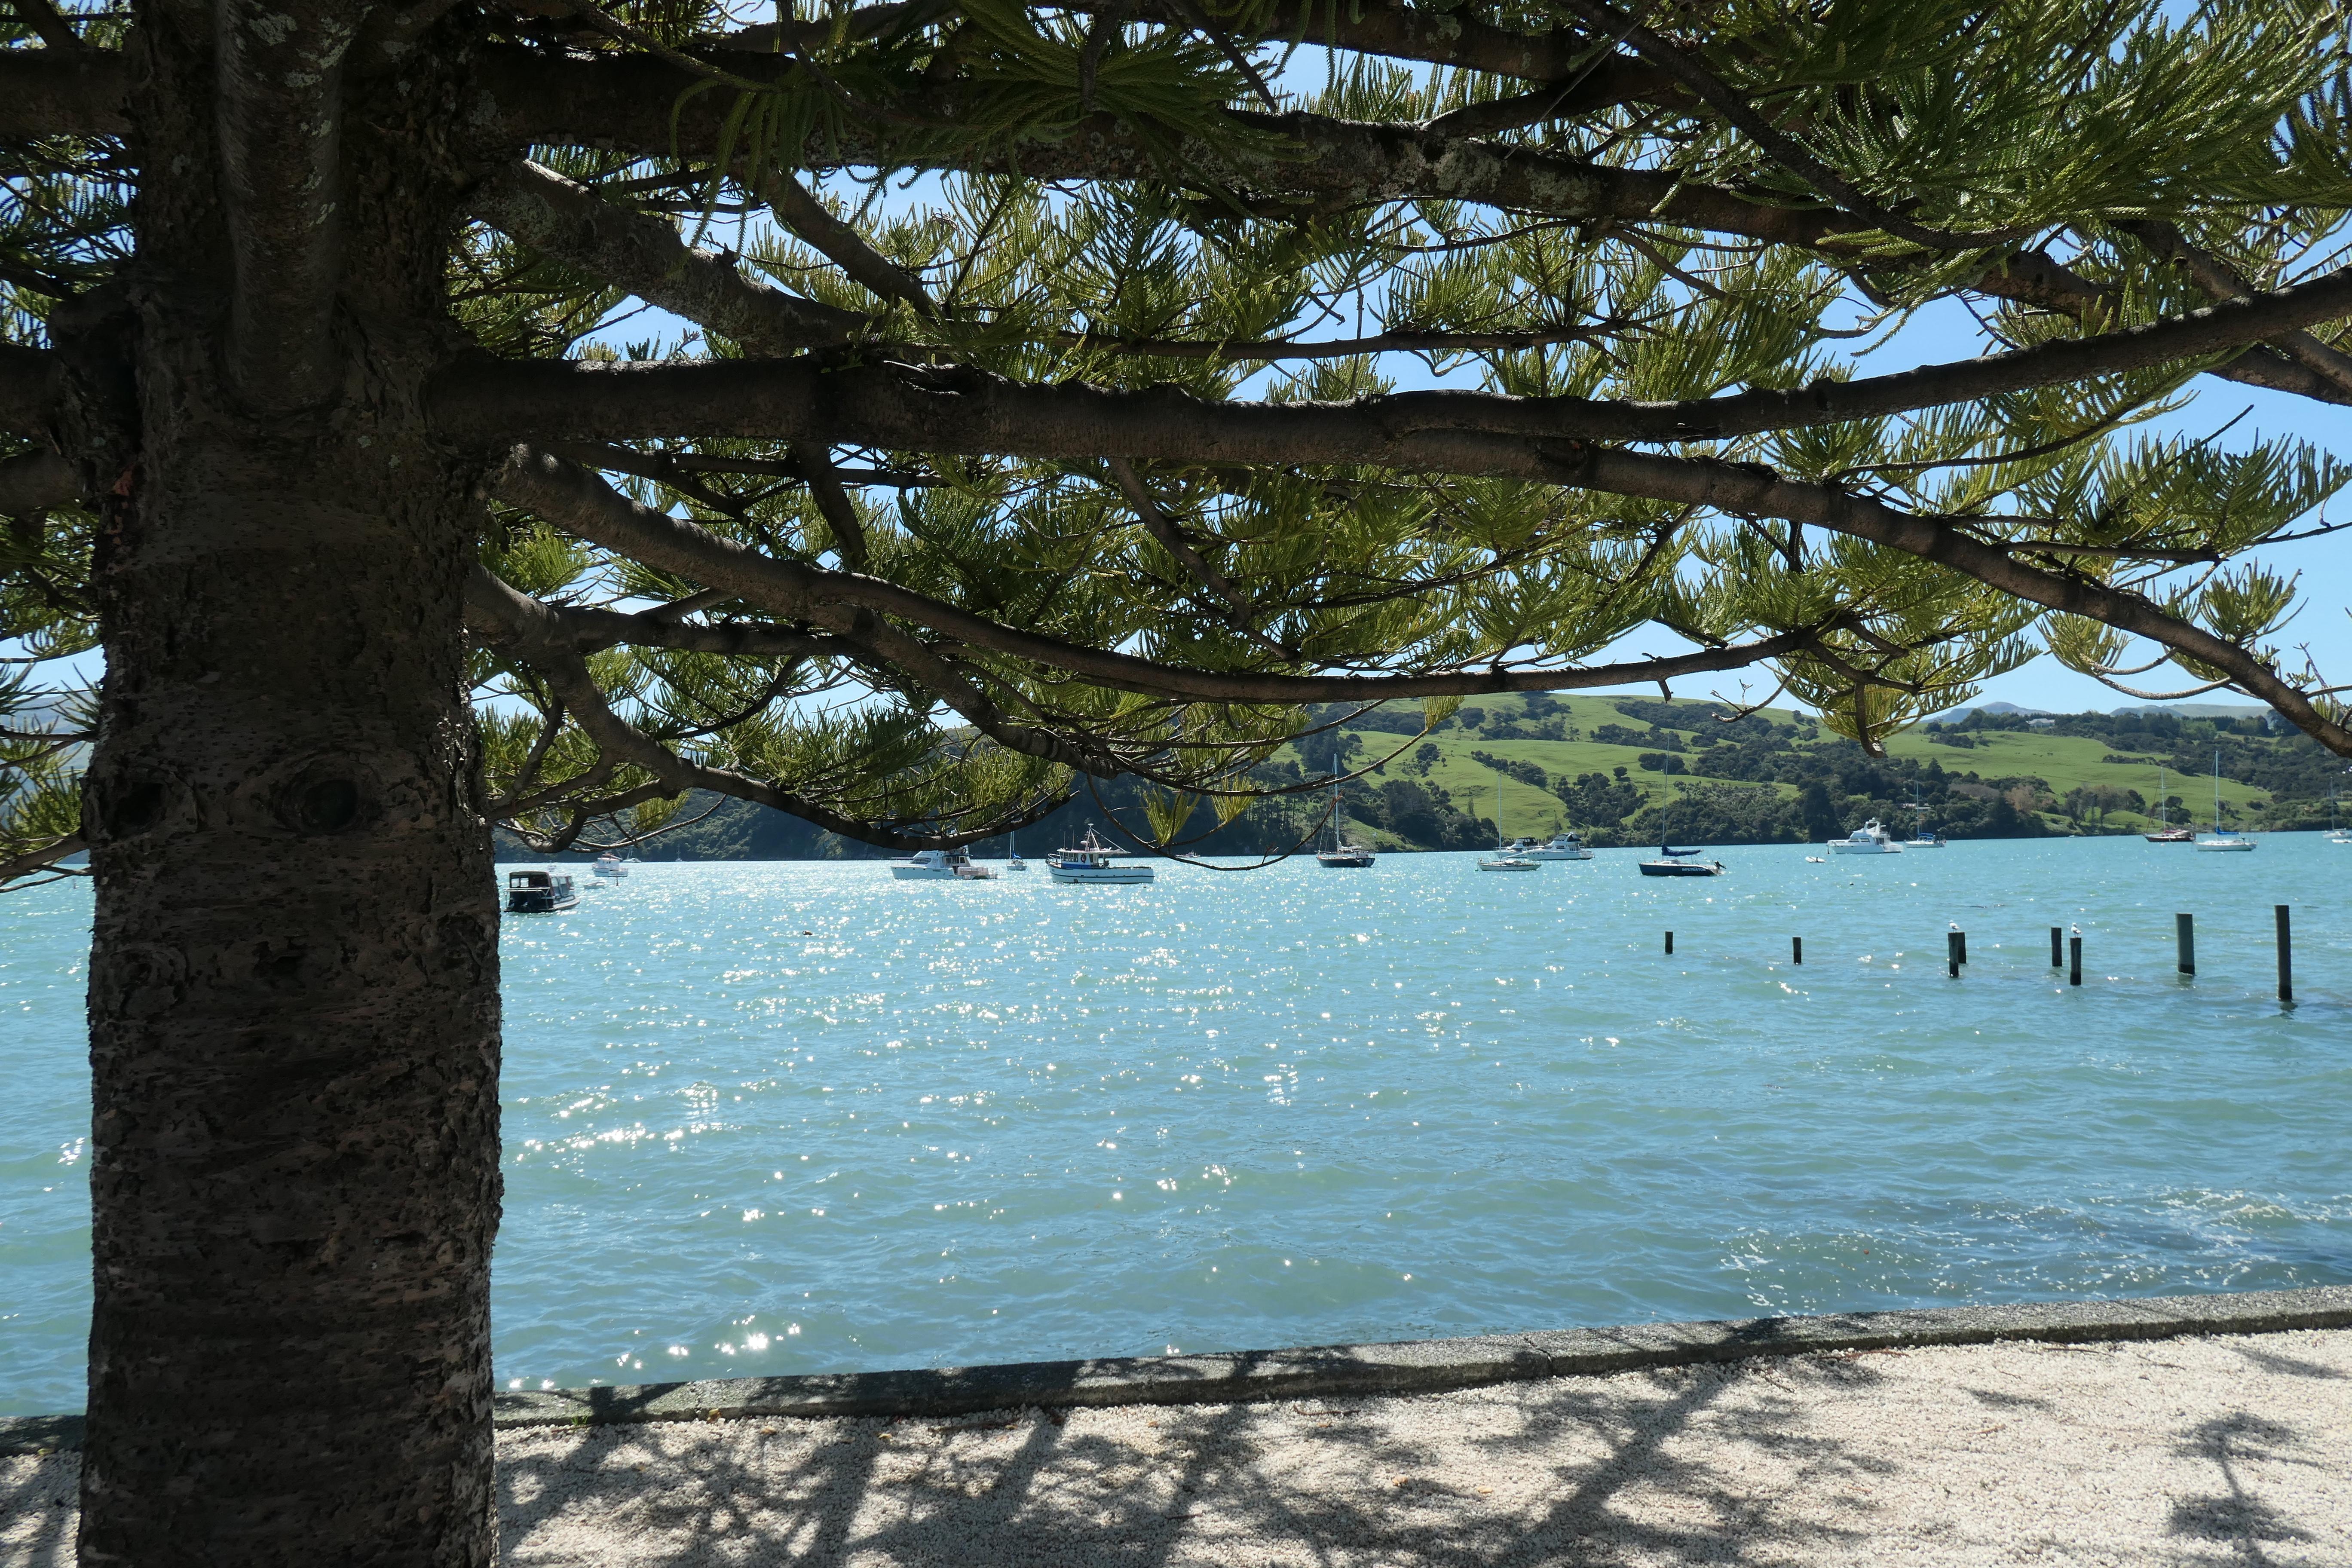 Over Ōtautahi, the all blacks en een mediteraan gevoel